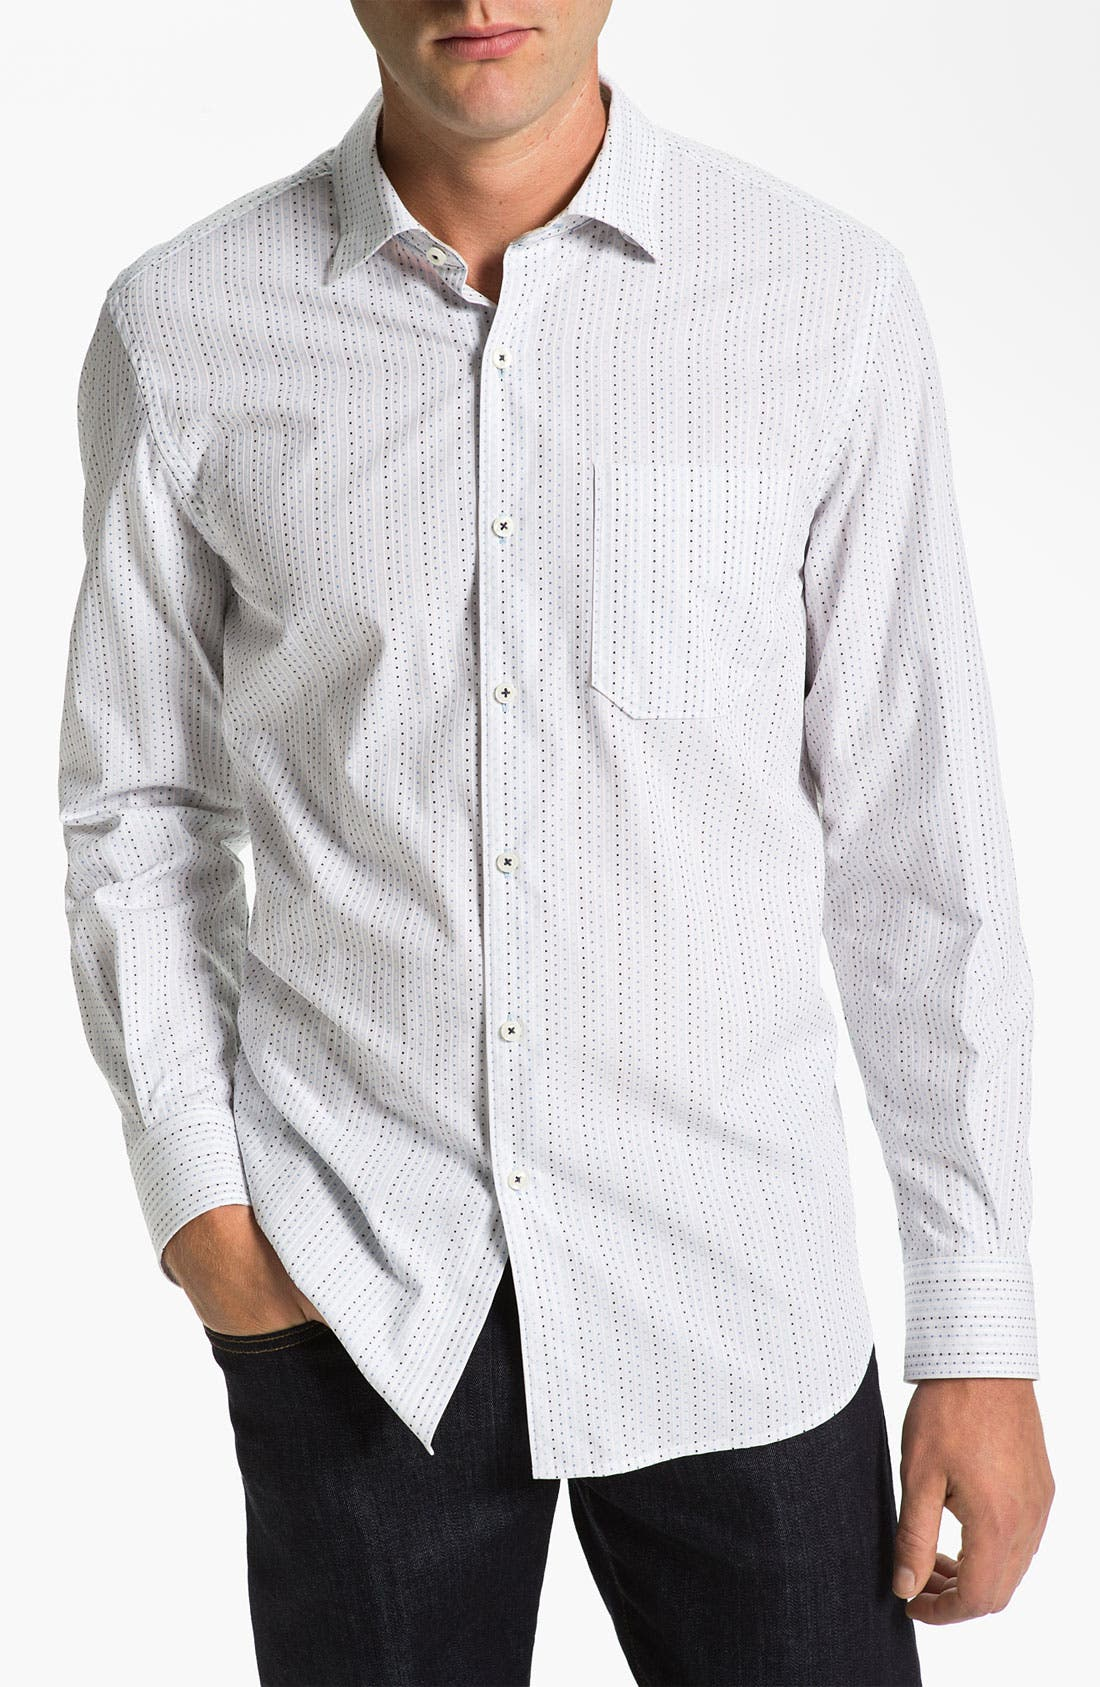 Alternate Image 1 Selected - Tommy Bahama 'Jacquart-a Stripe' Sport Shirt